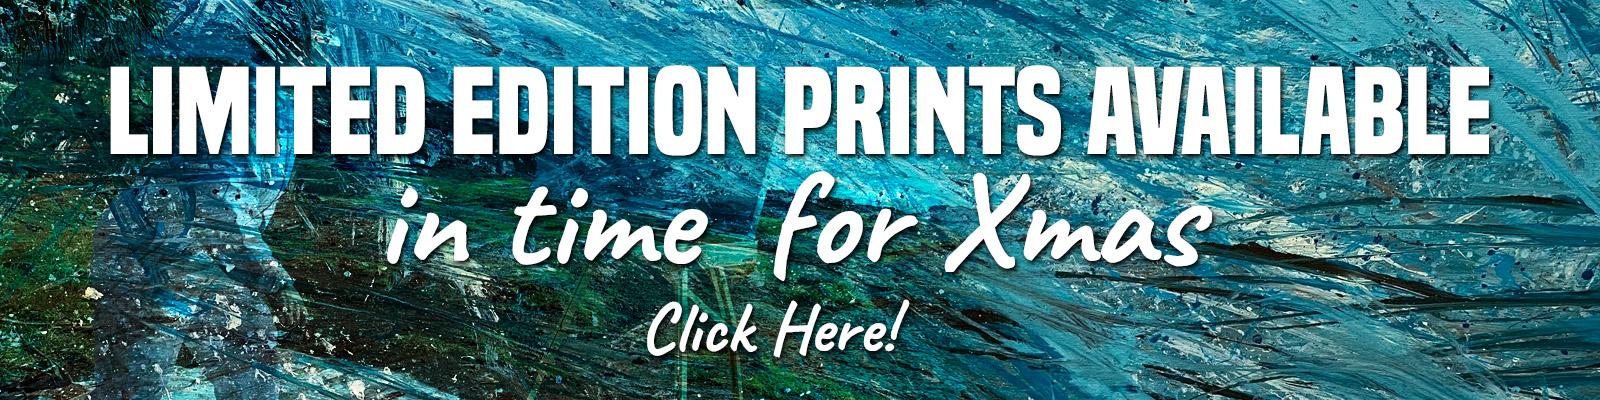 frankie j banks limited edition prints